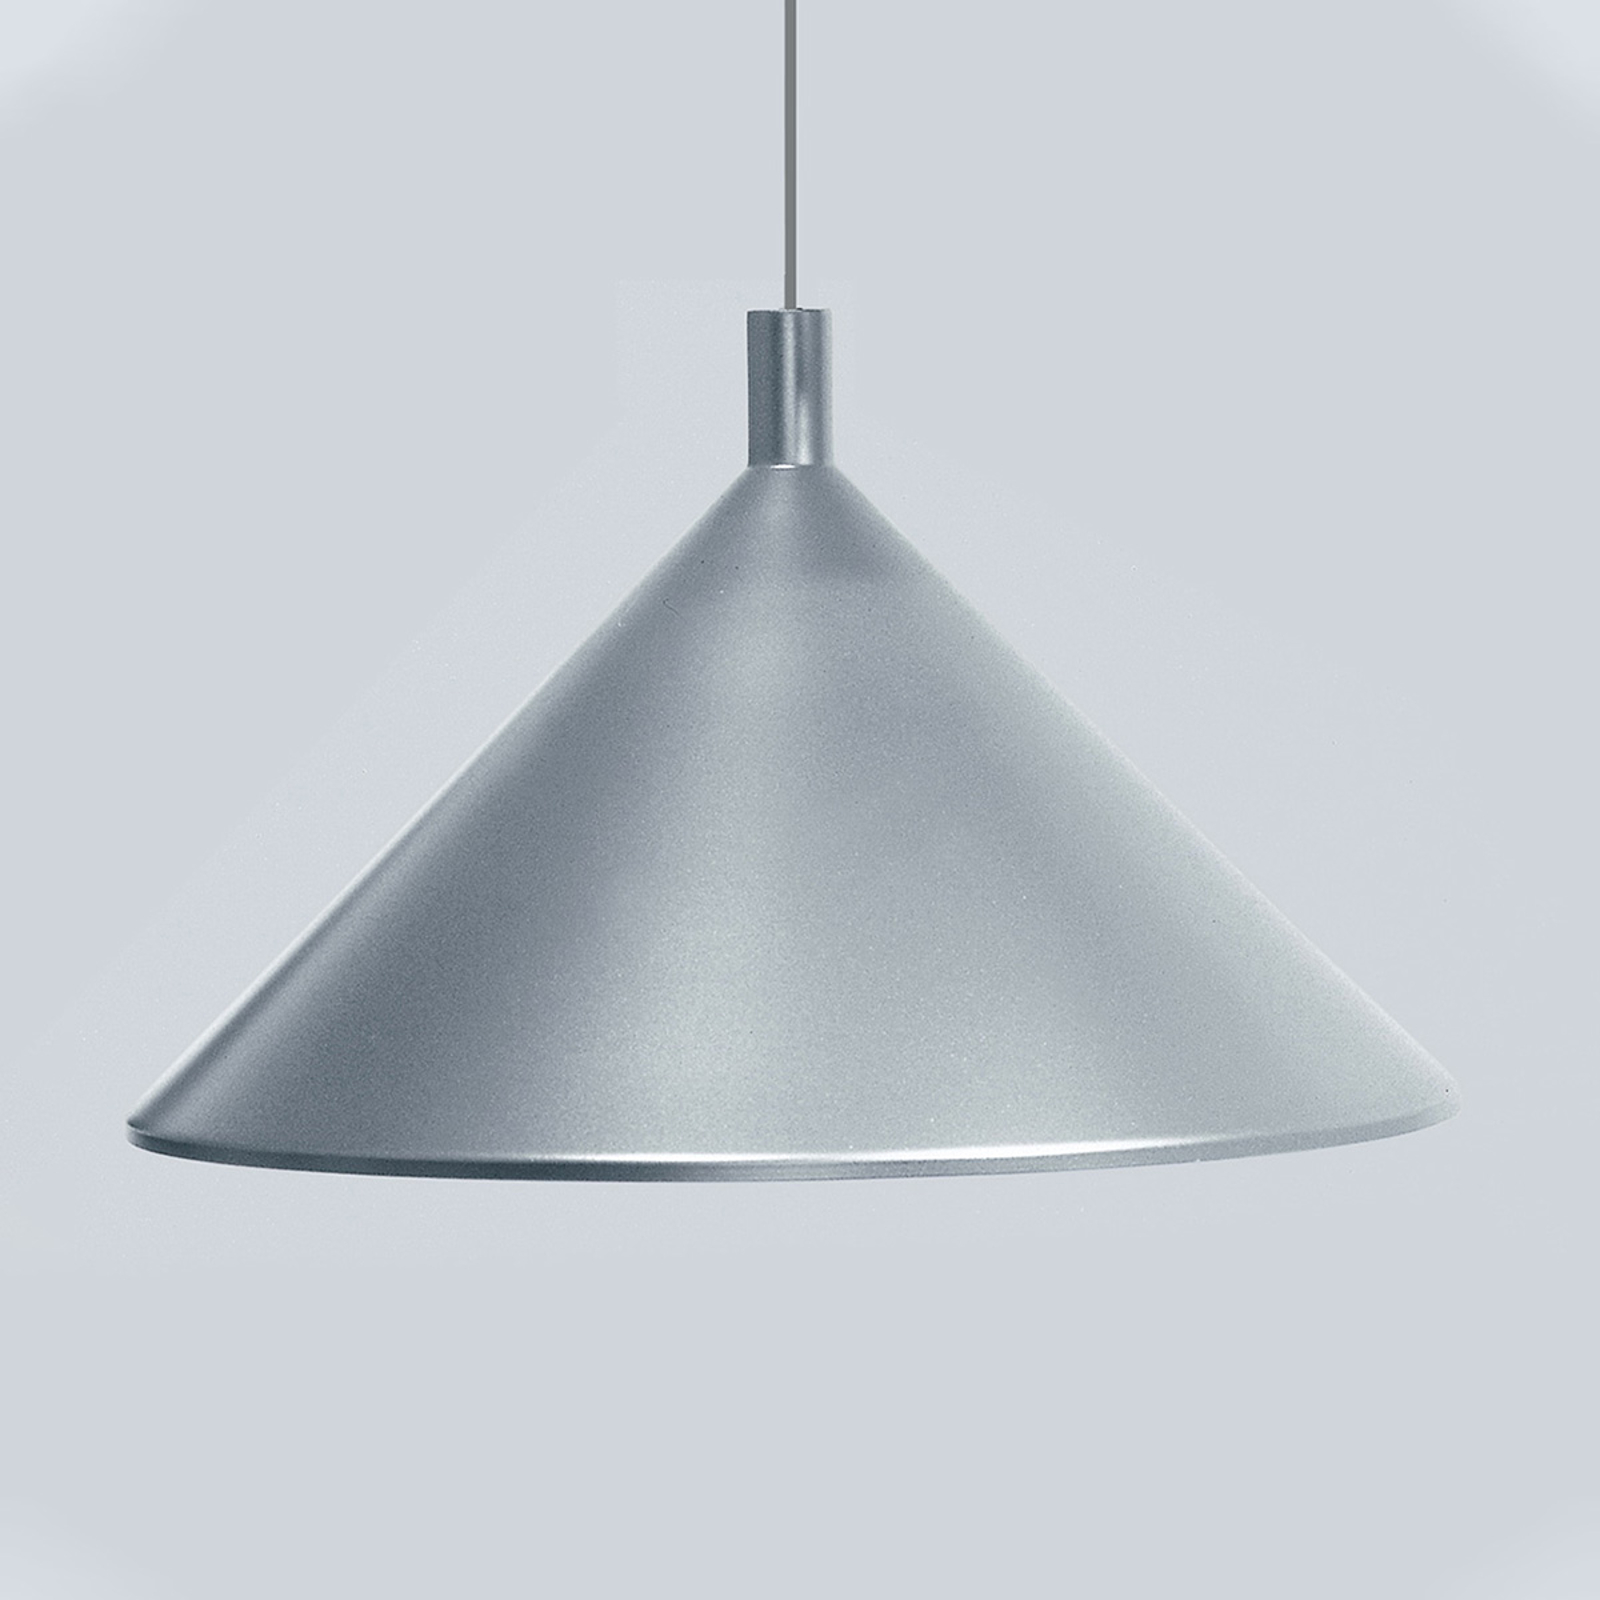 Martinelli Luce Cono hanglamp grijs, Ø 30 cm